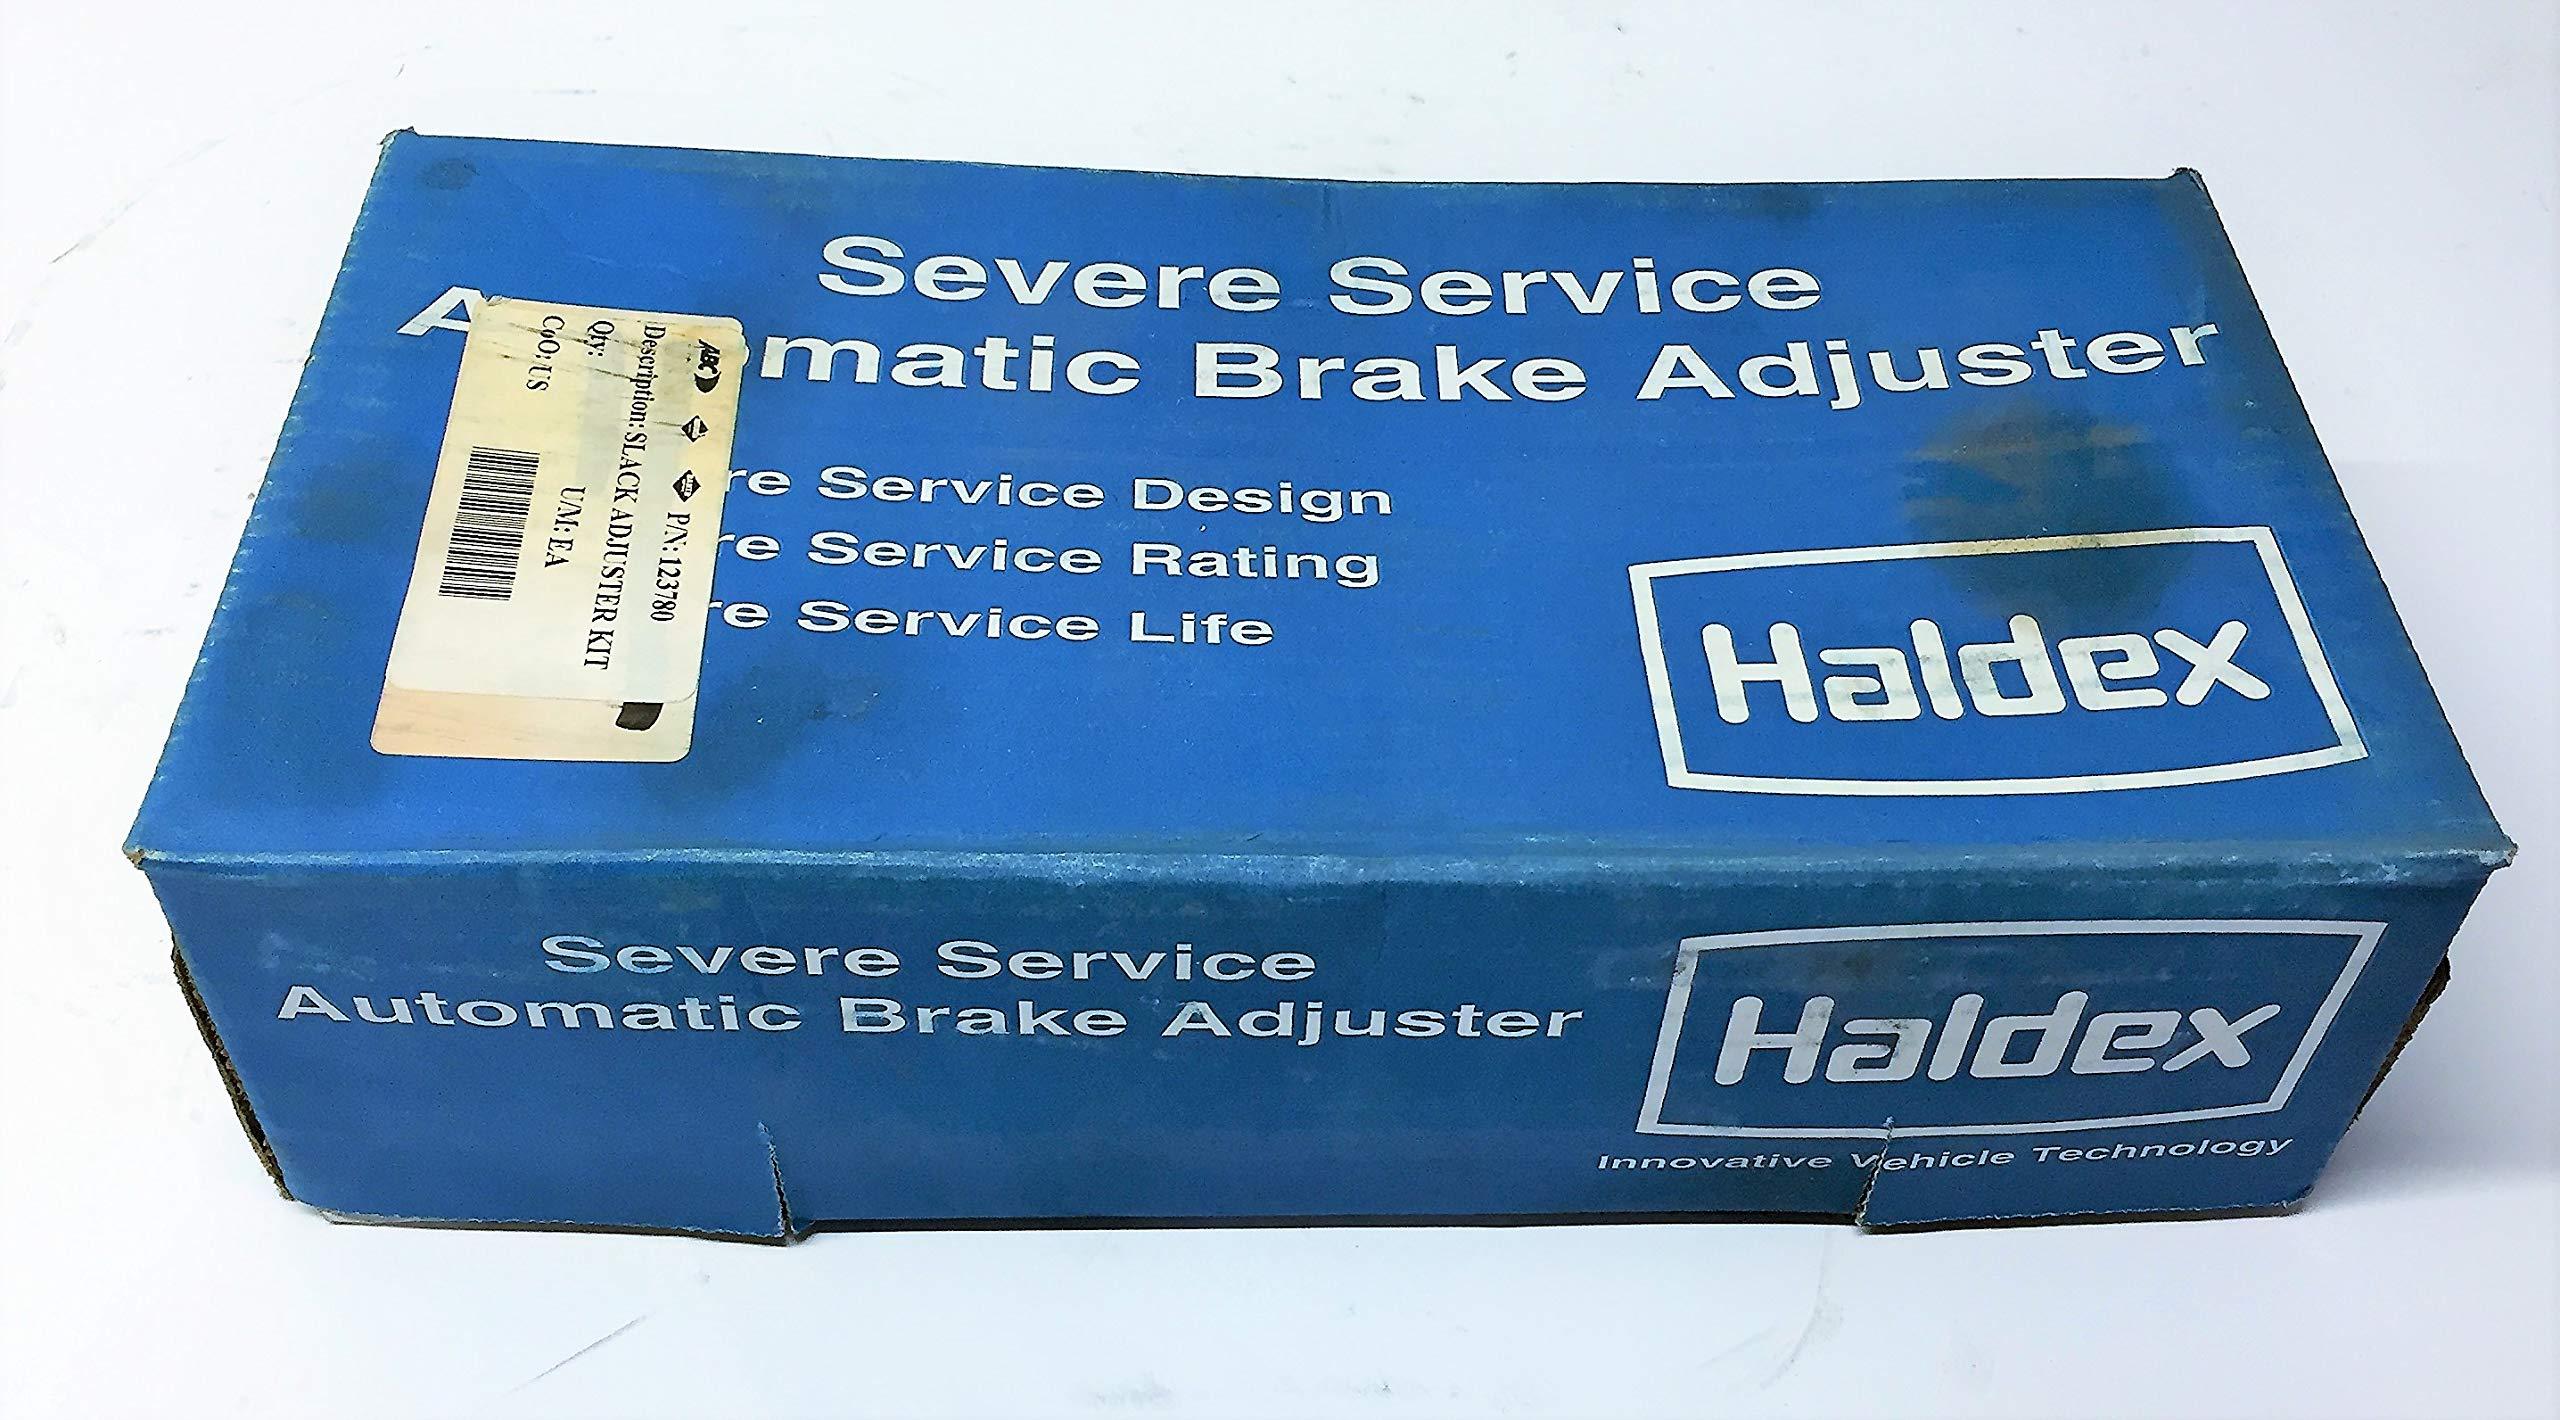 Haldex Automatic Brake Adjuster 300-10001 by Haldex (Image #8)